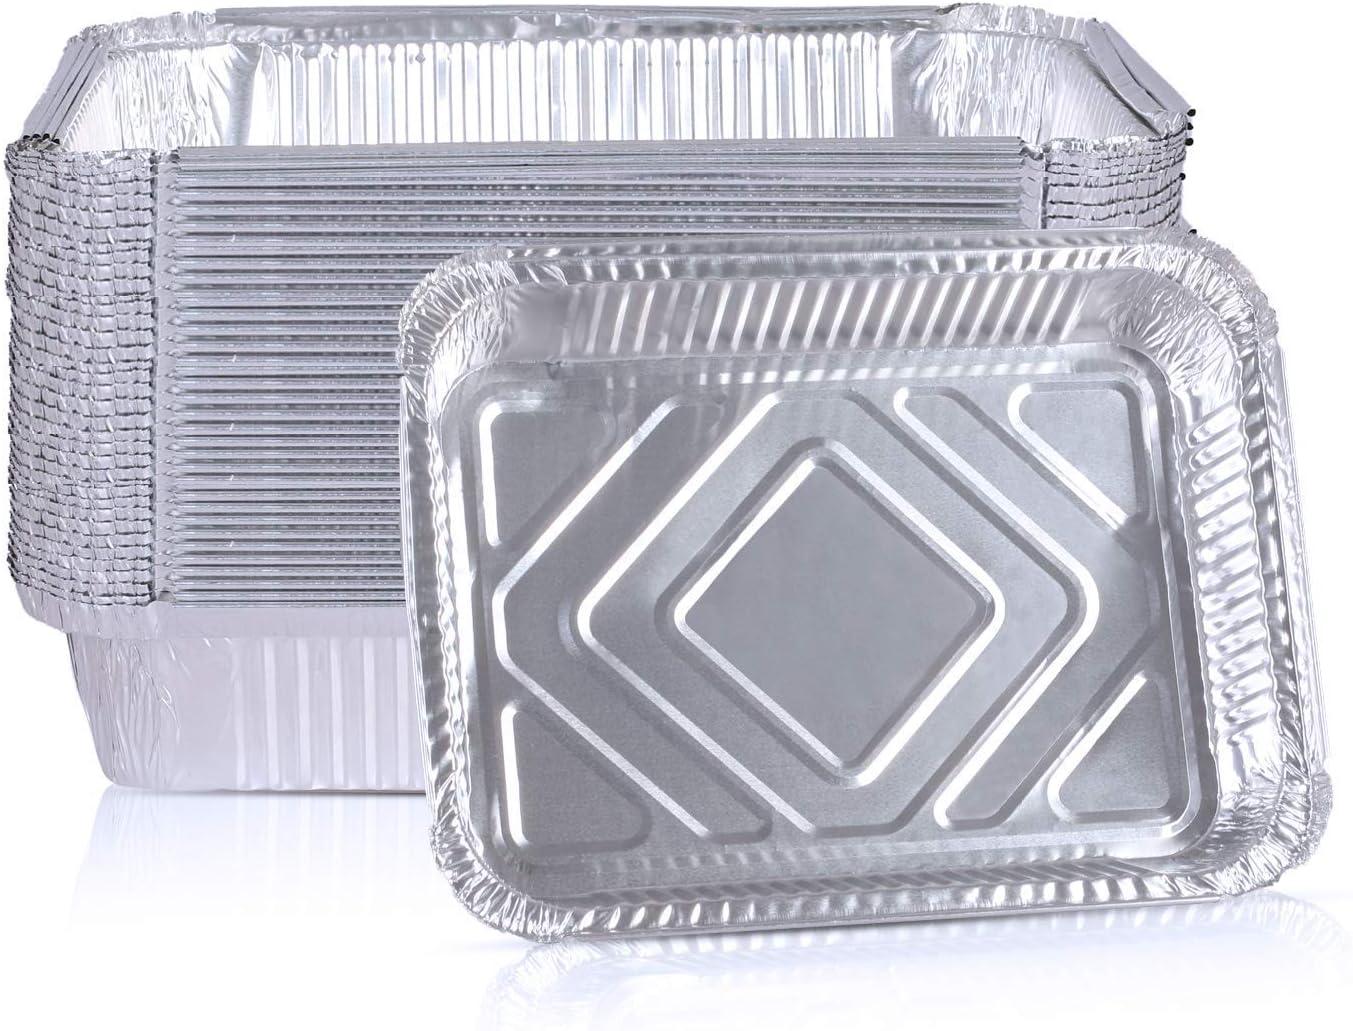 "Rongrong 30 Packs Aluminum Foil Baki 9x6.7"" Bombing new work Disposable Pans Genuine"